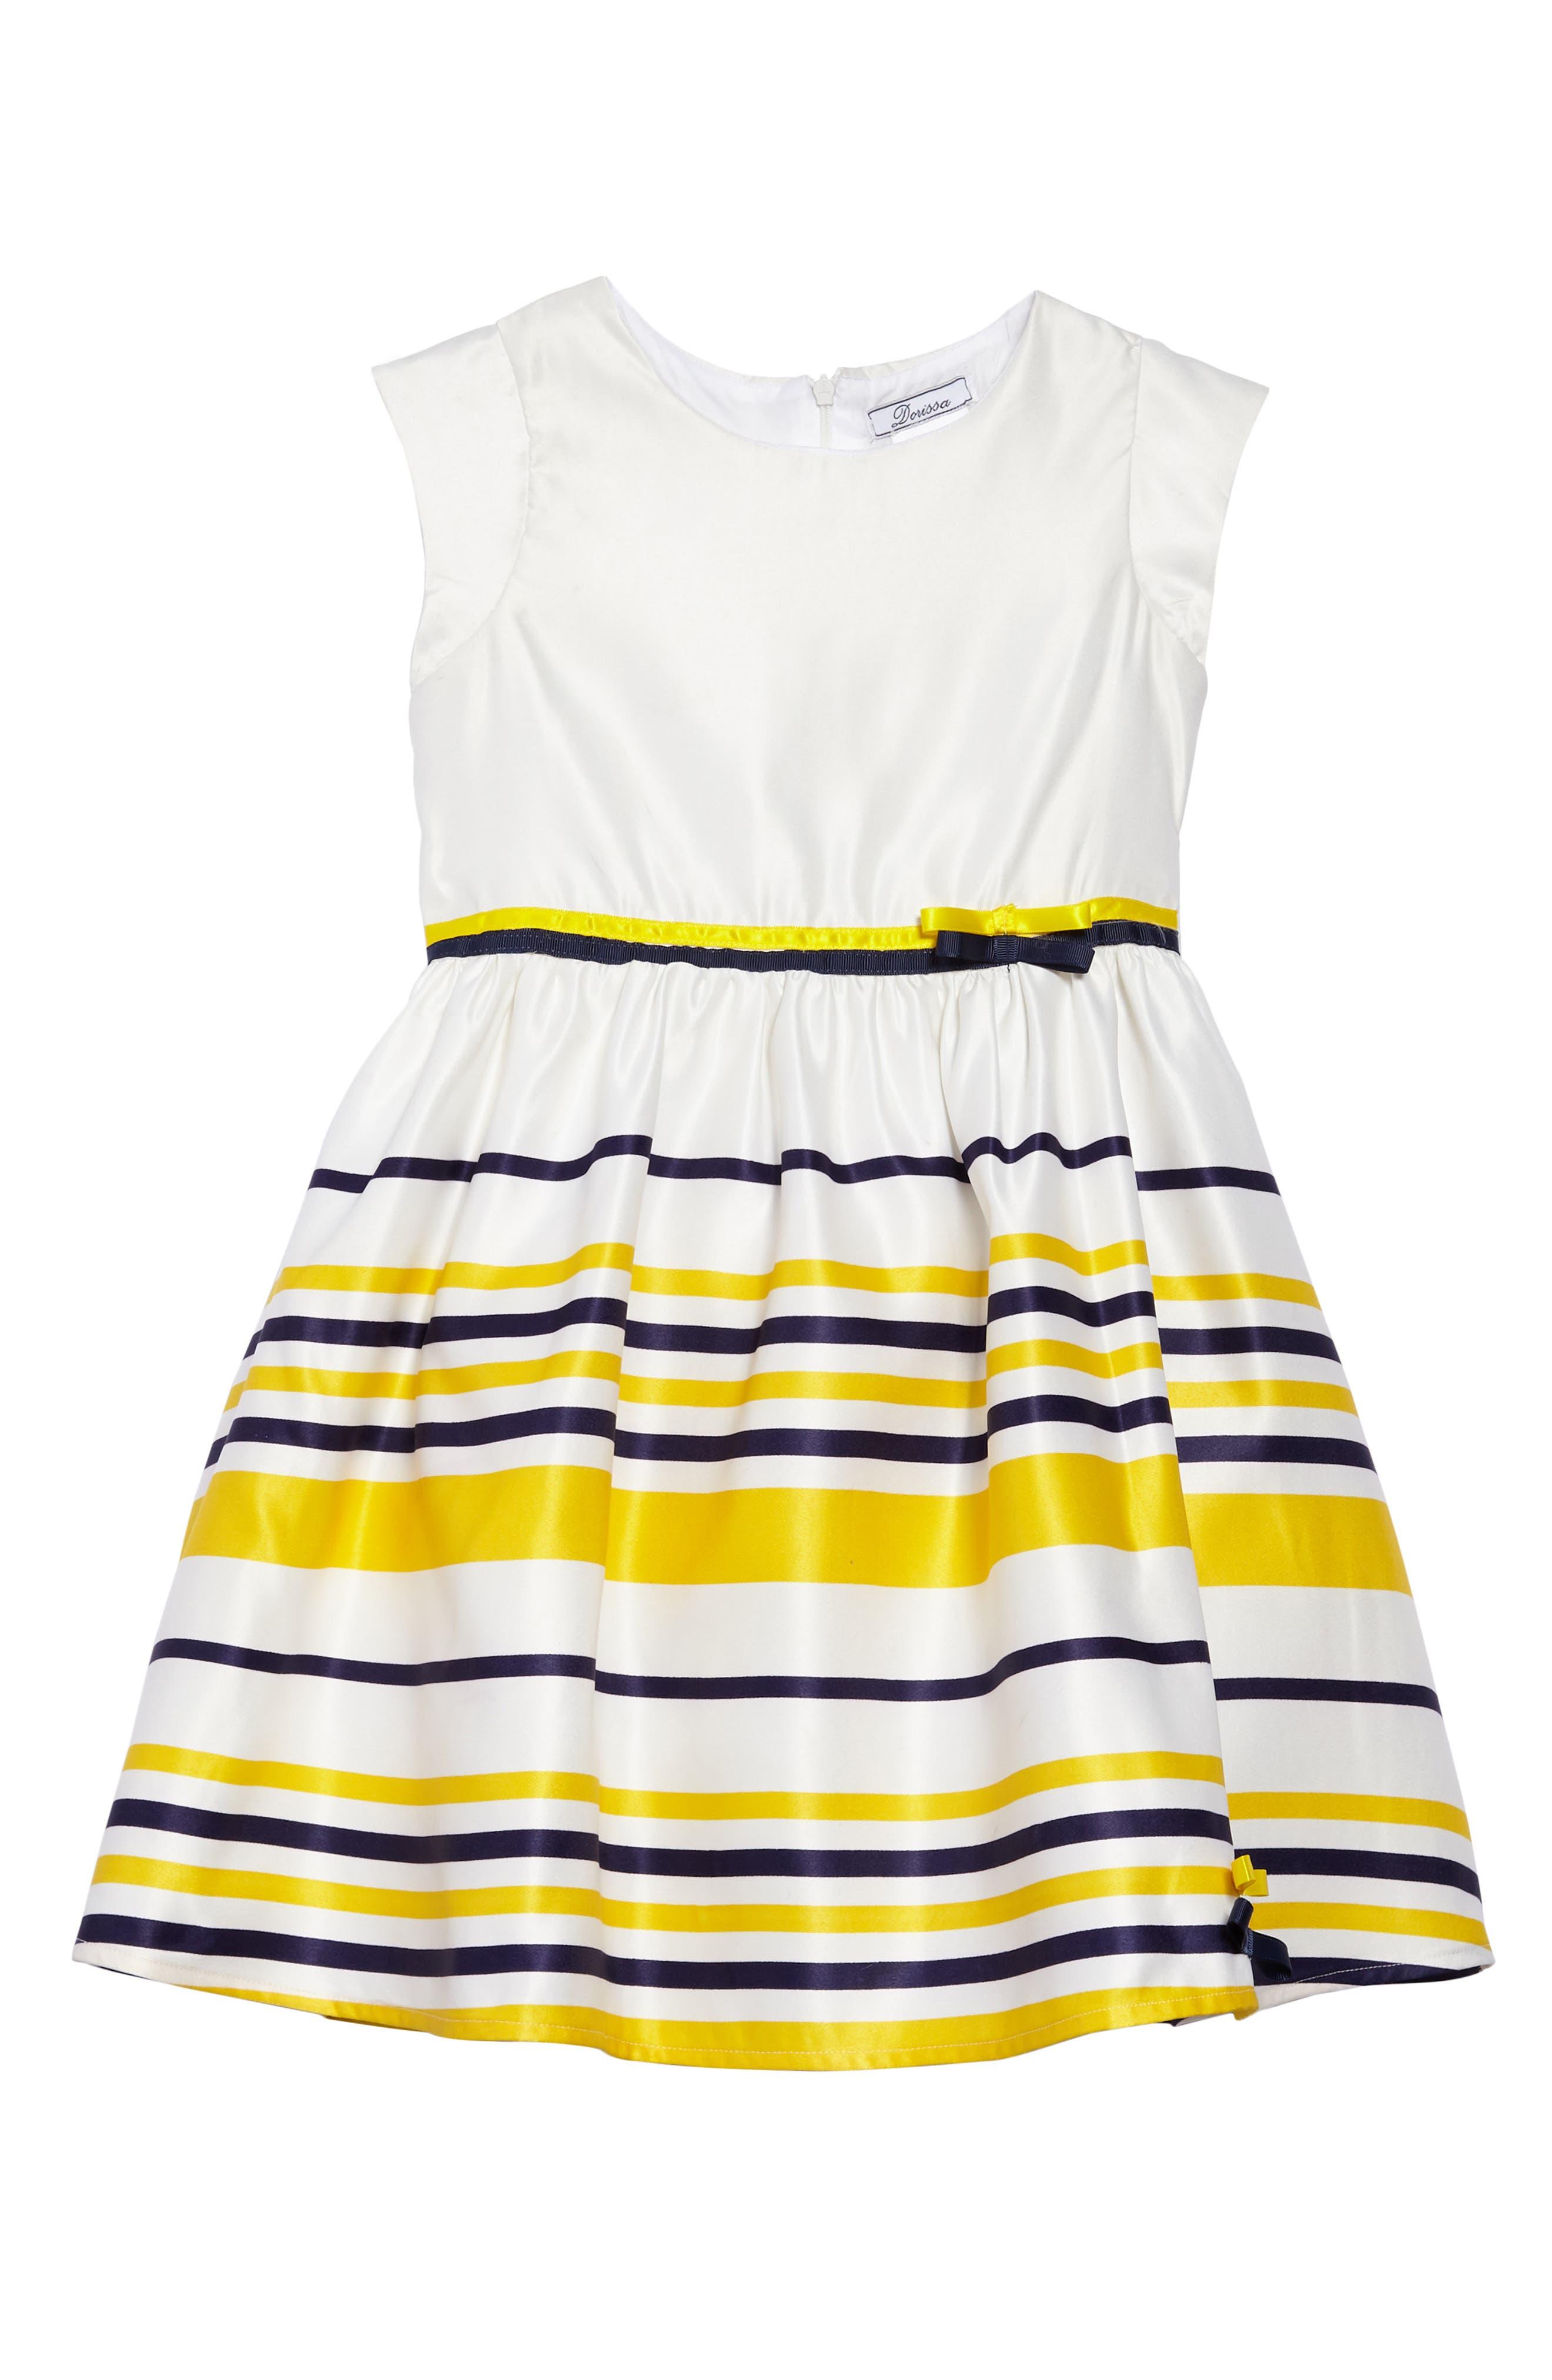 Carly Sleeveless Dress,                             Main thumbnail 1, color,                             White/ Multi